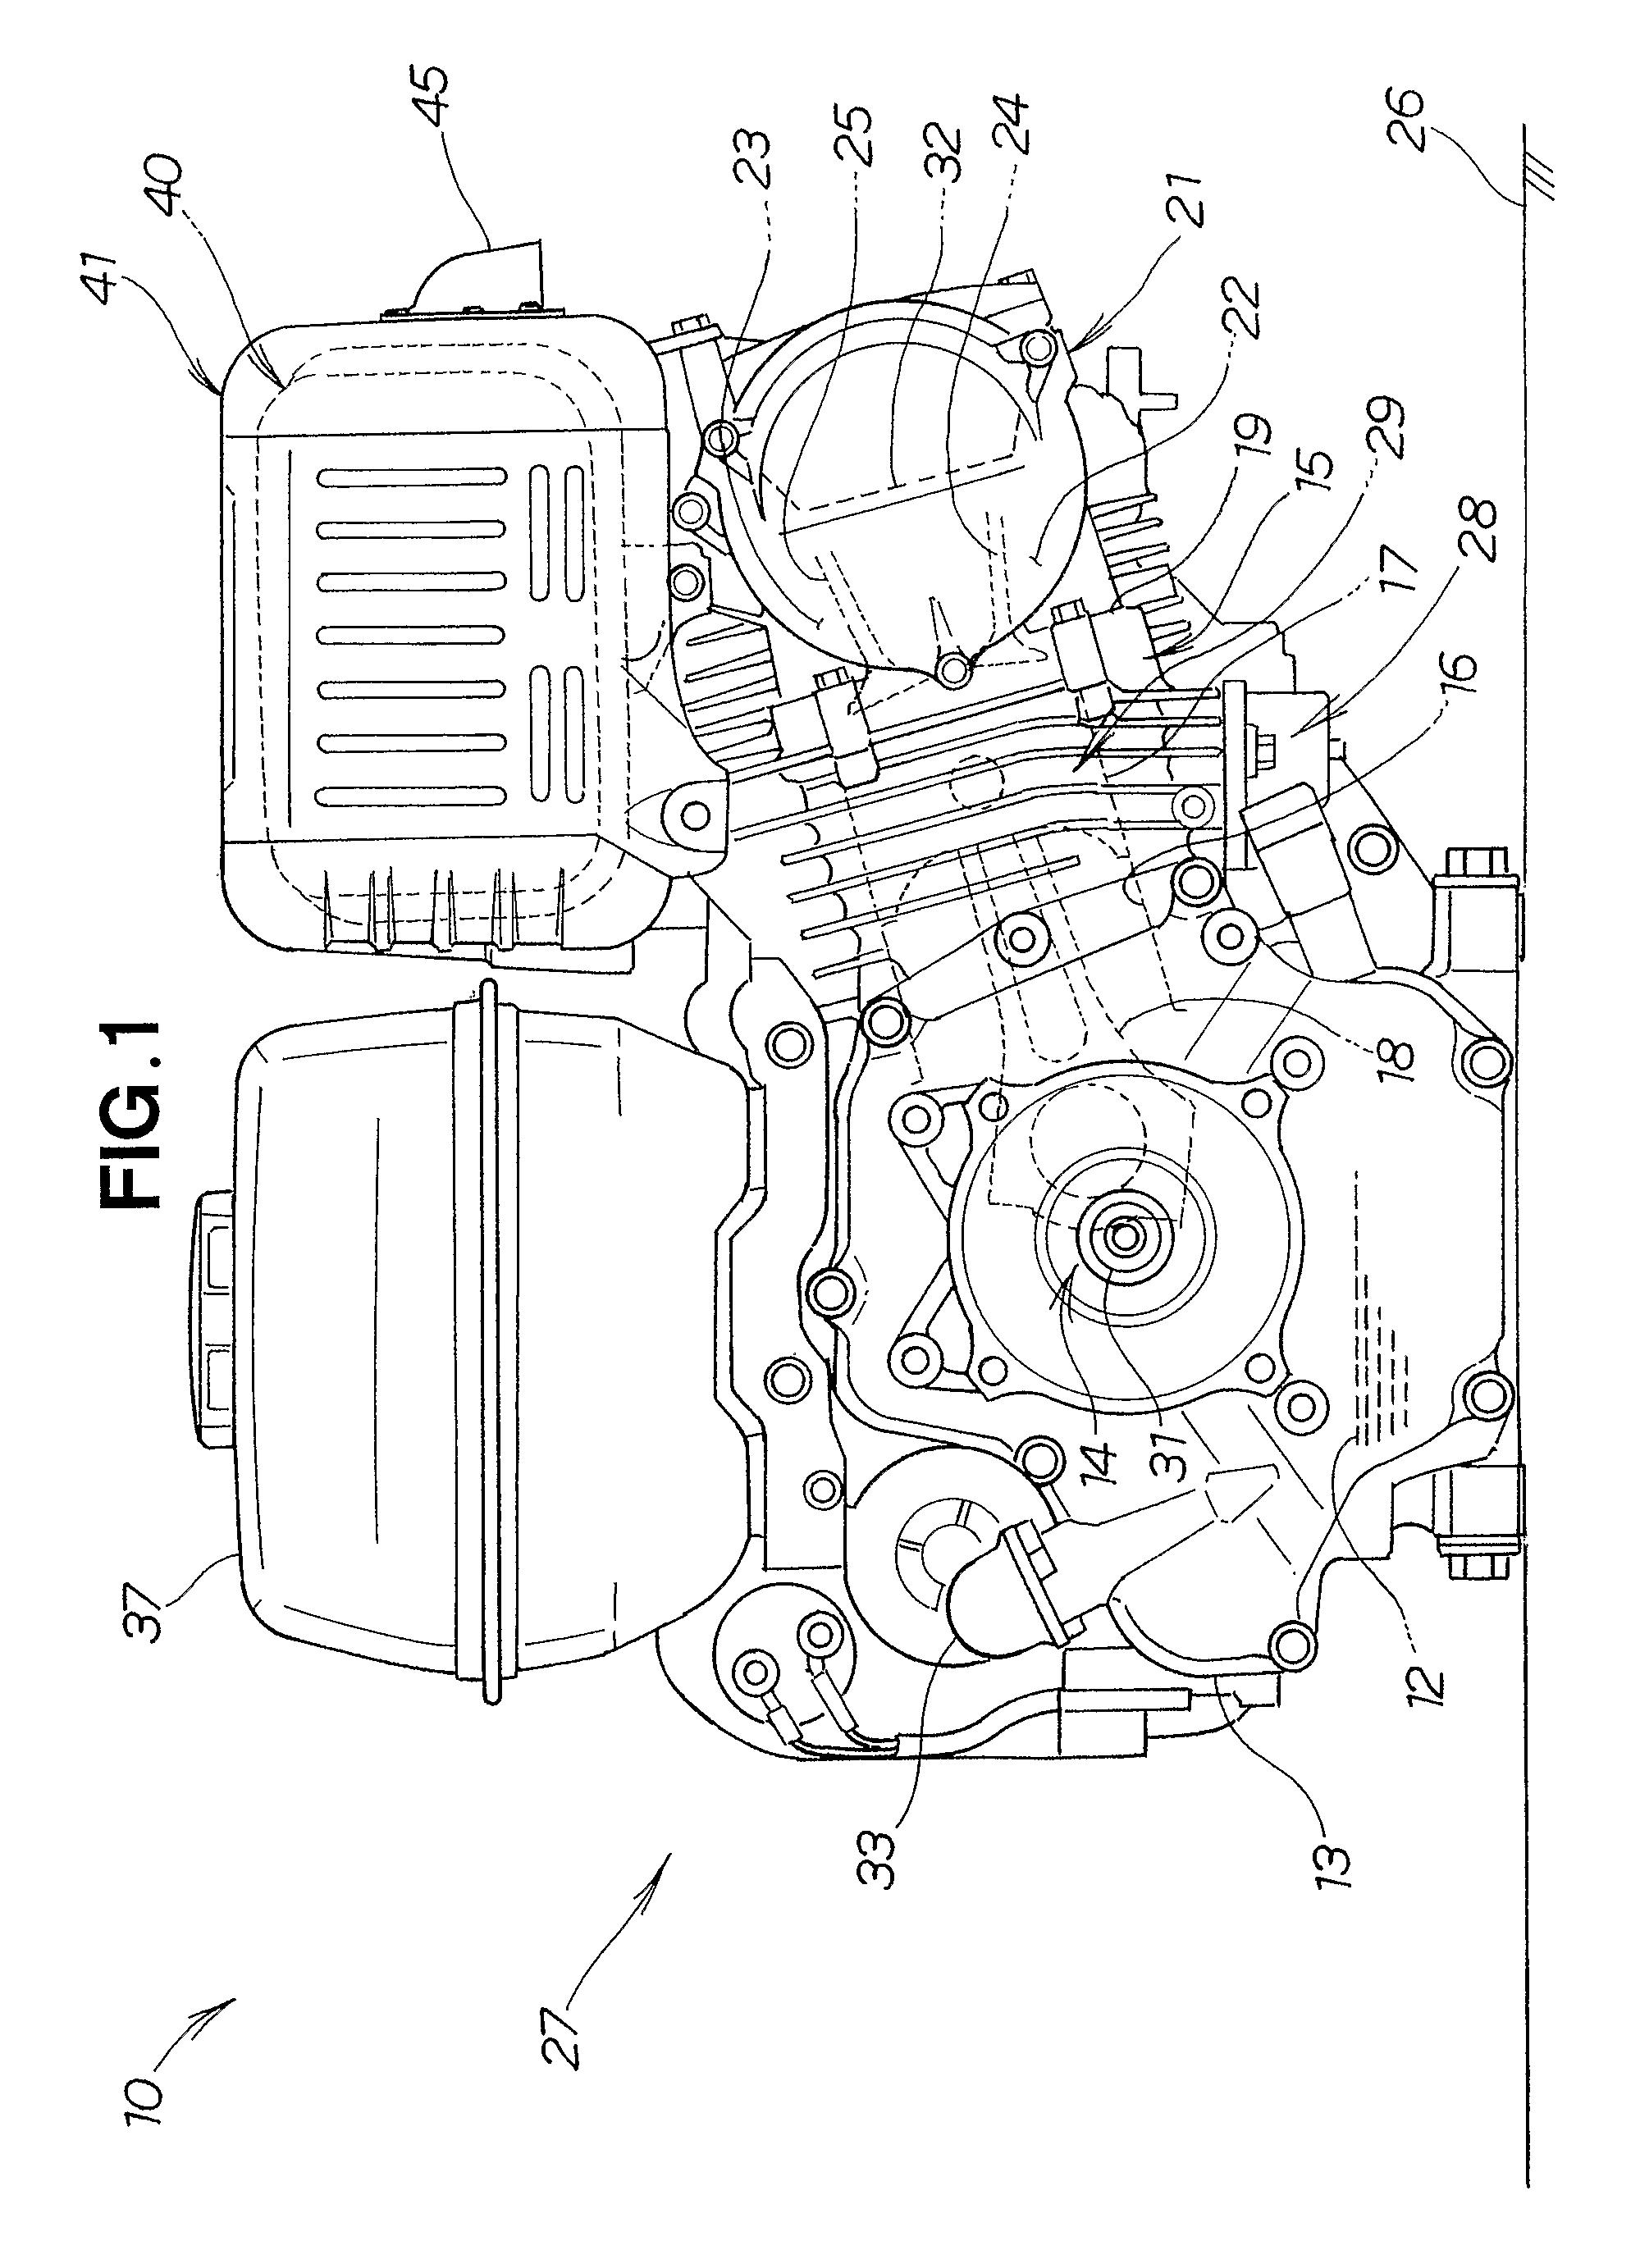 32 Wilson Alternator Wiring Diagram